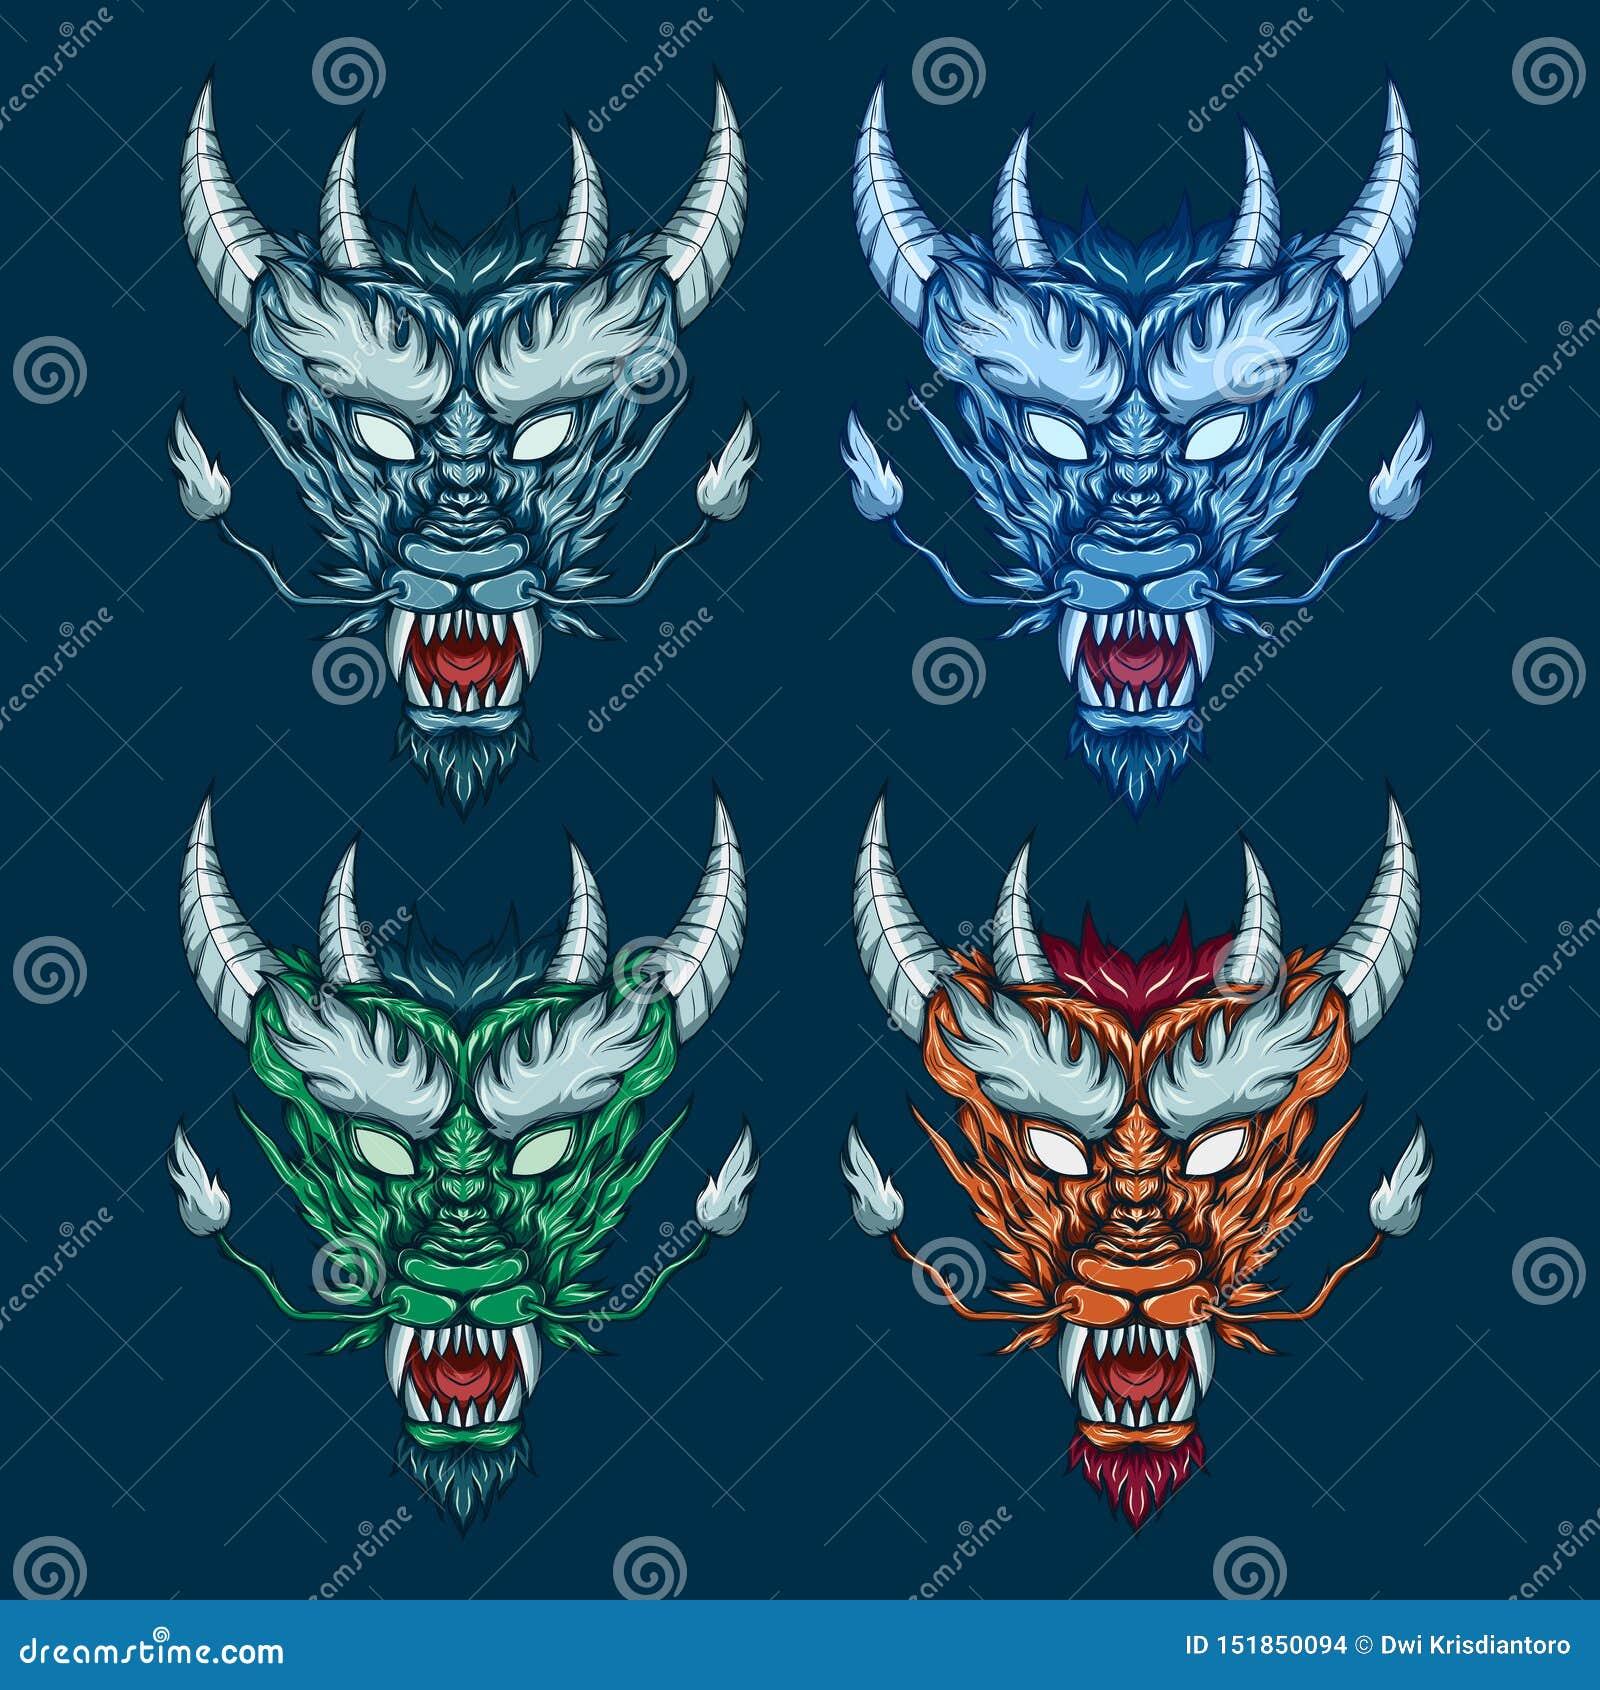 Mythical dragon head set illustration. Detailed vector art of a horned mythological dragon head